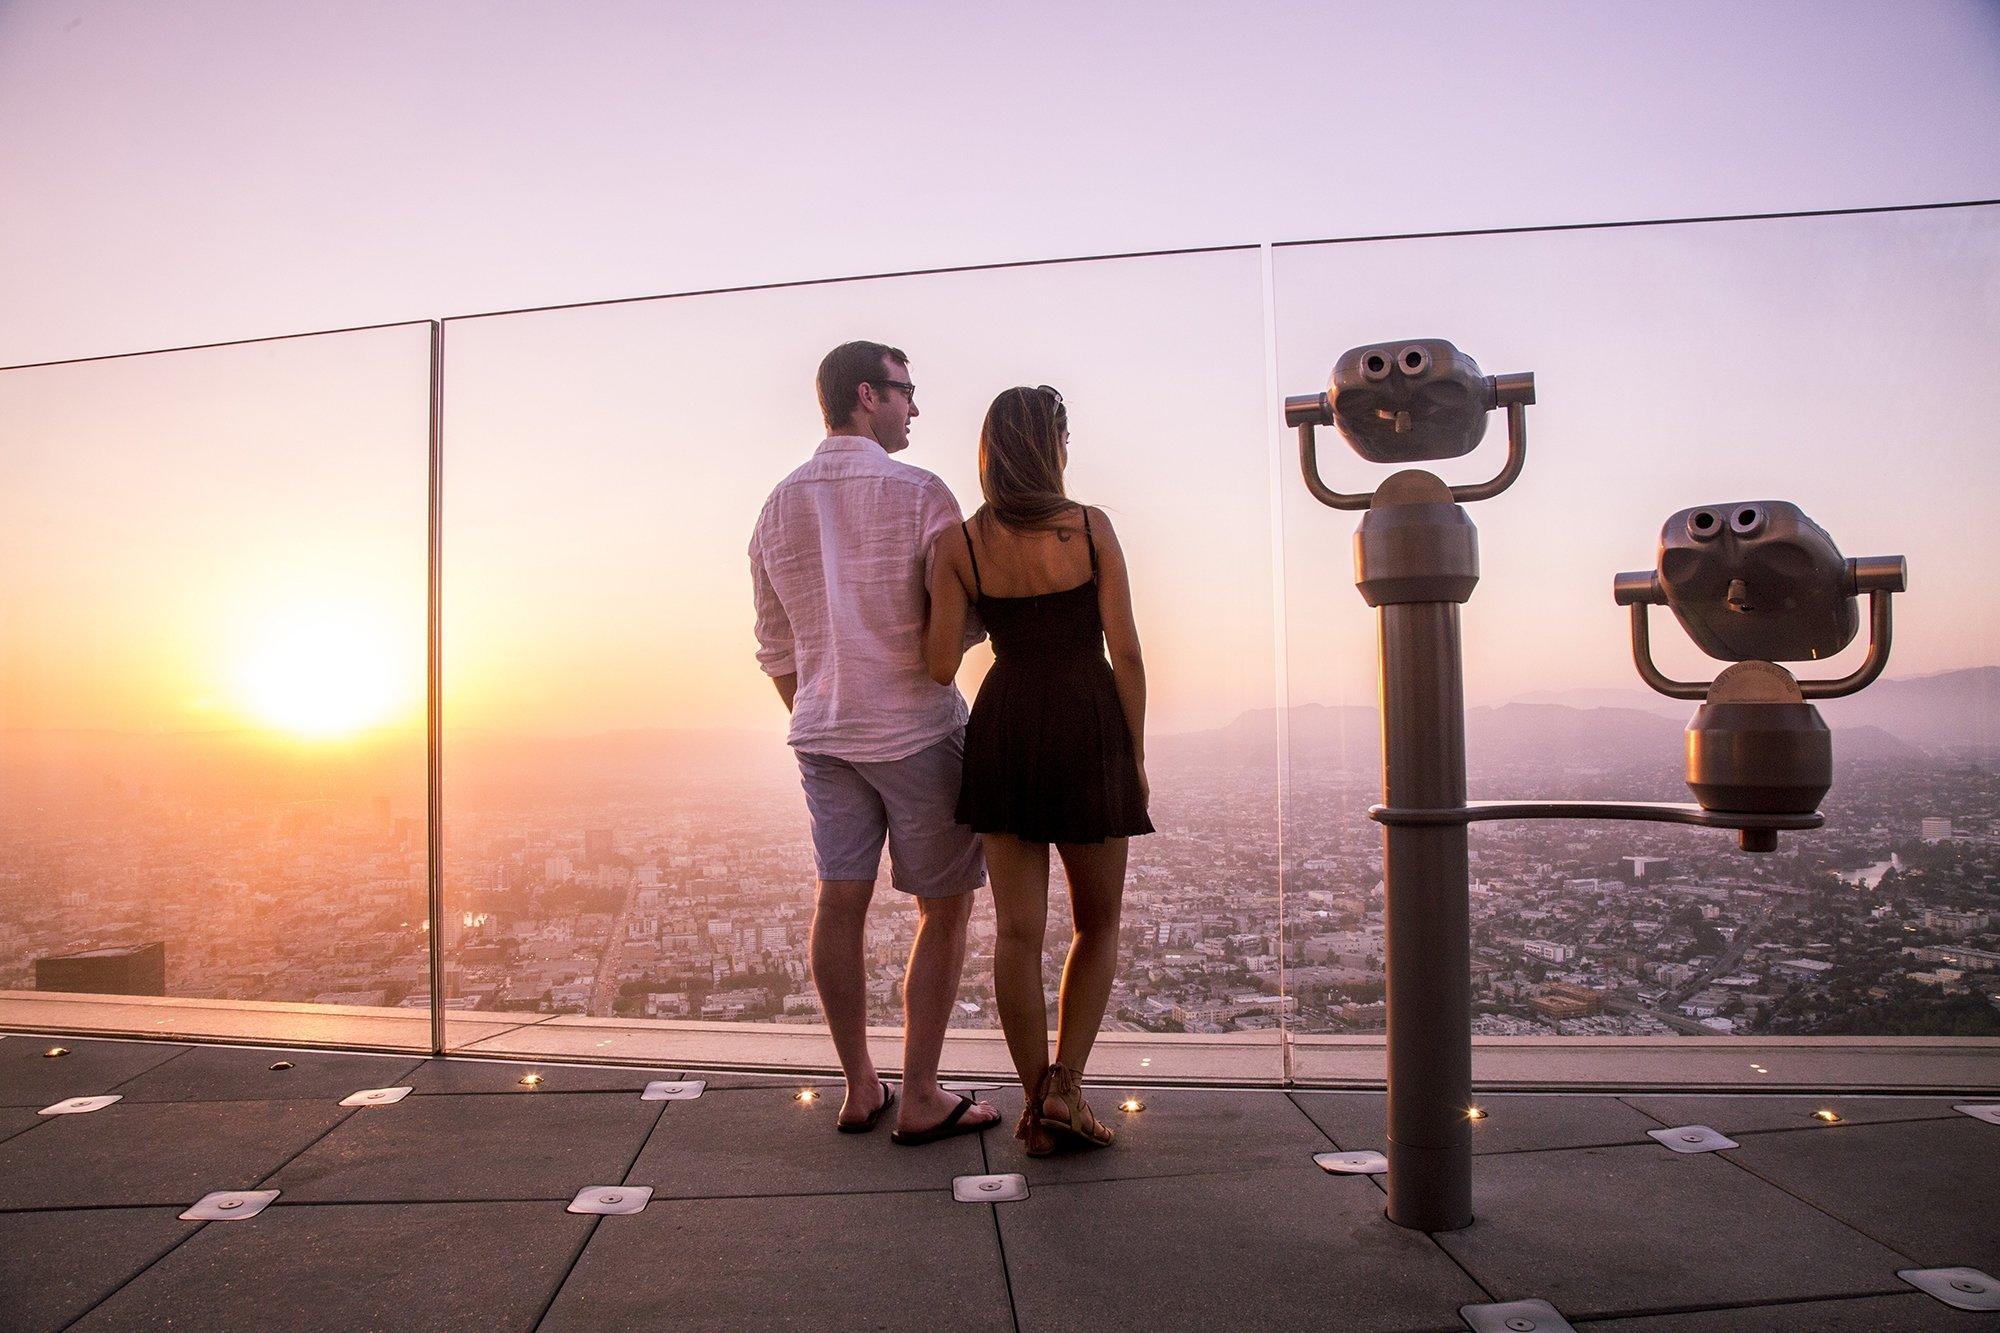 10 Amazing Fun Date Ideas Los Angeles great valentines day date ideas for los angeles couples cbs los 9 2020